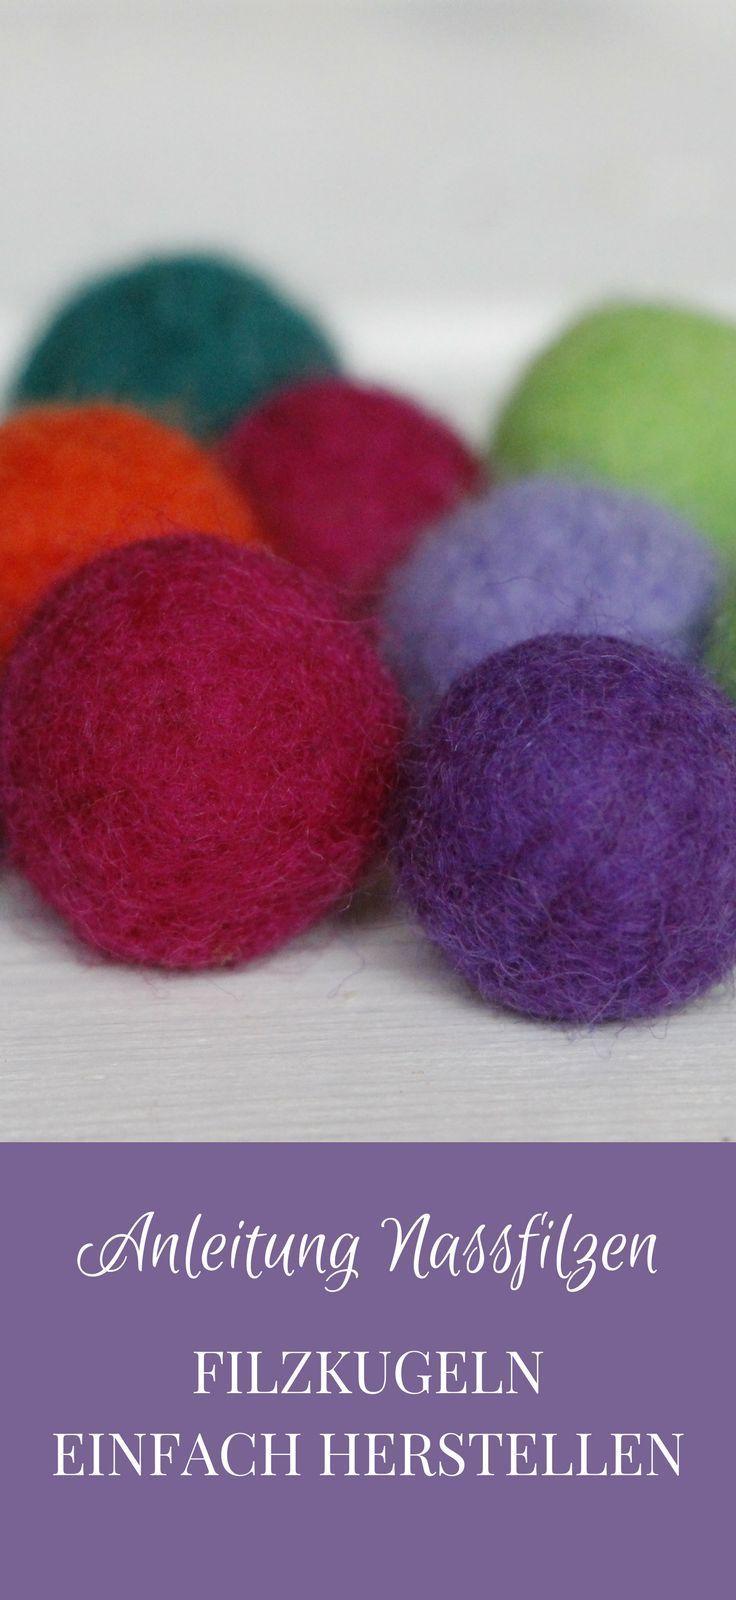 Herbstdeko fürs Fenster: Filzkugel-Mobile mit Naturmaterialien - Lavendelblog